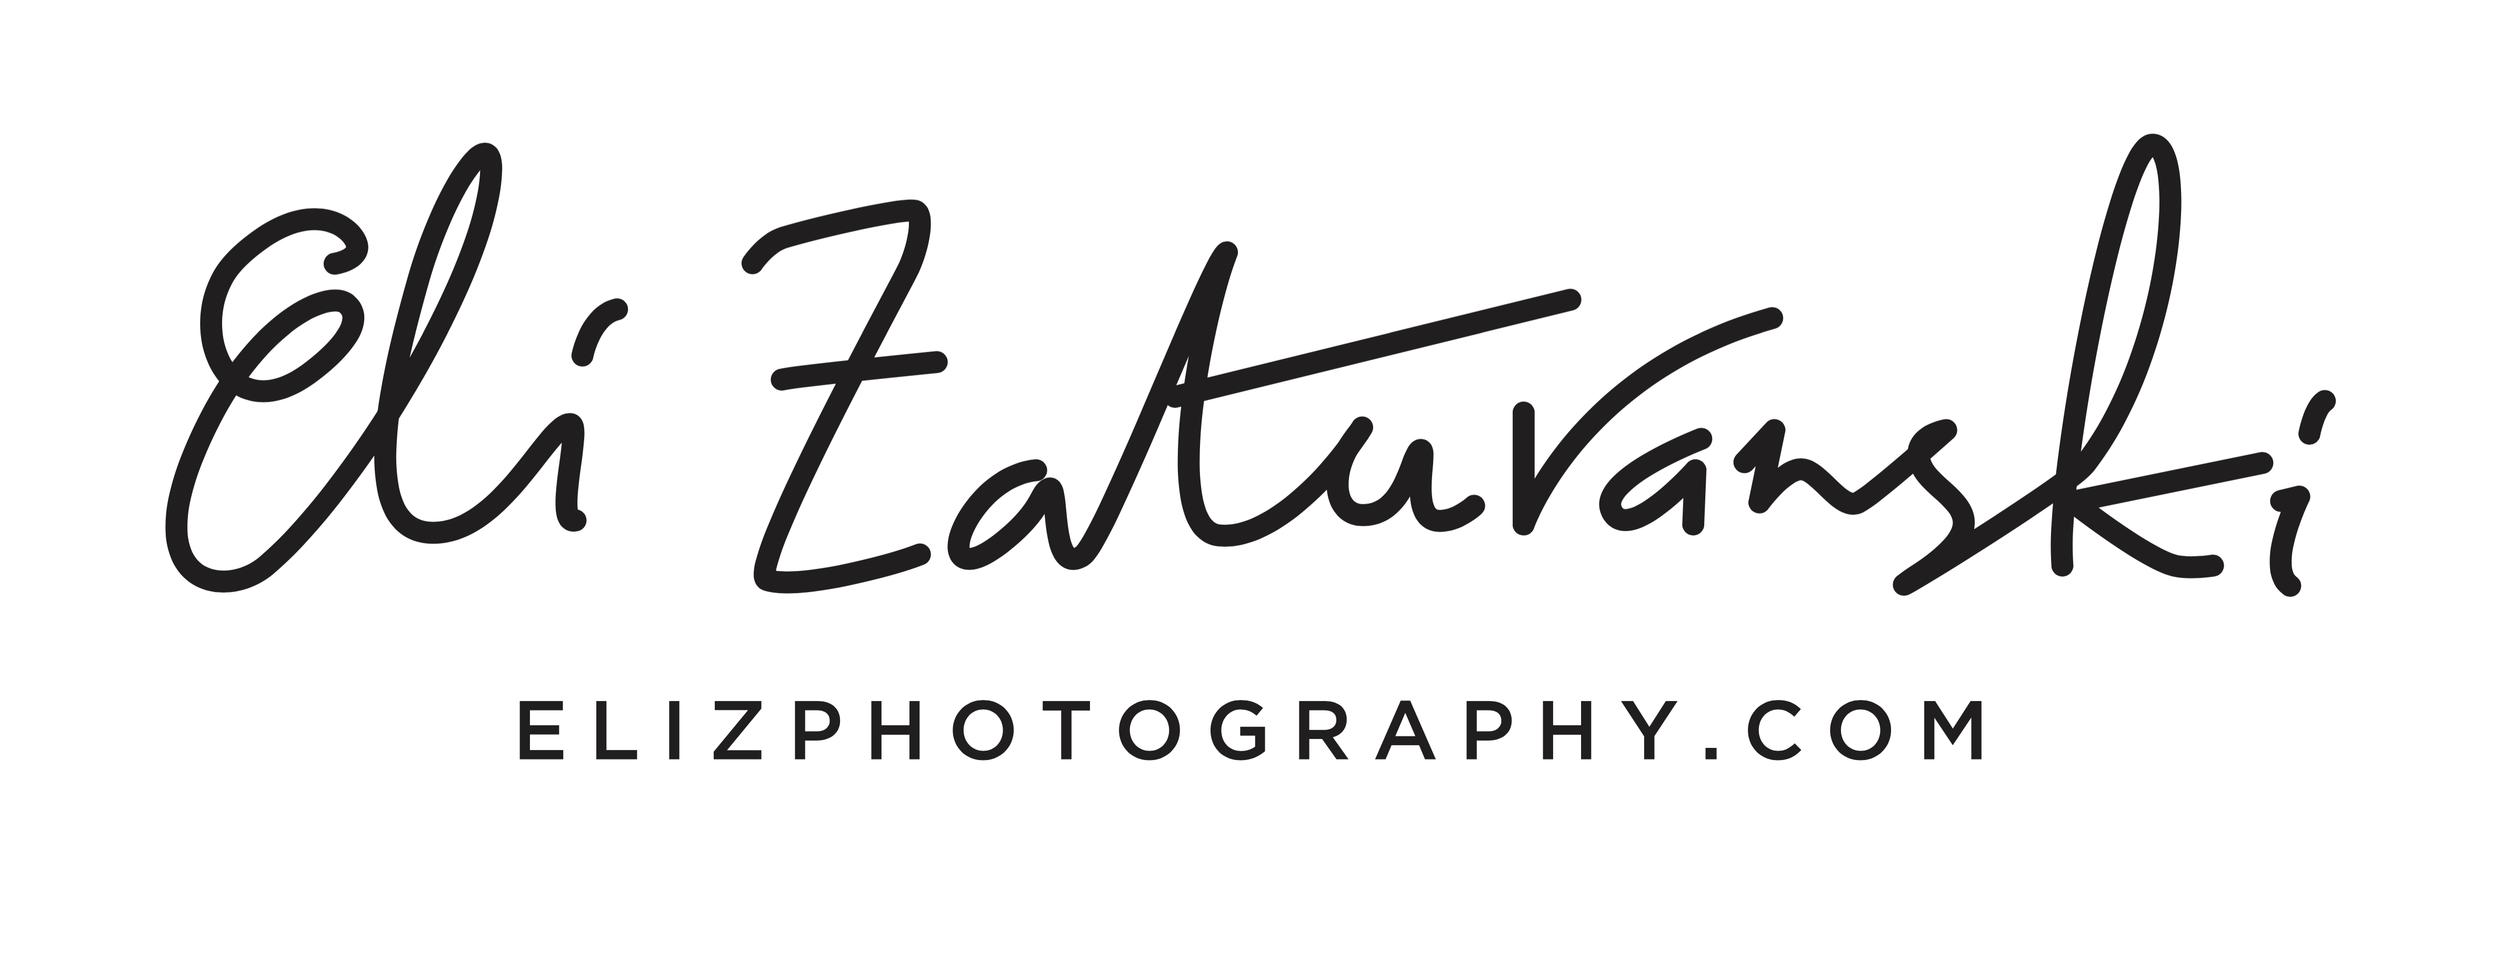 eli-zaturanski-photography-sponsor-late-nite-art